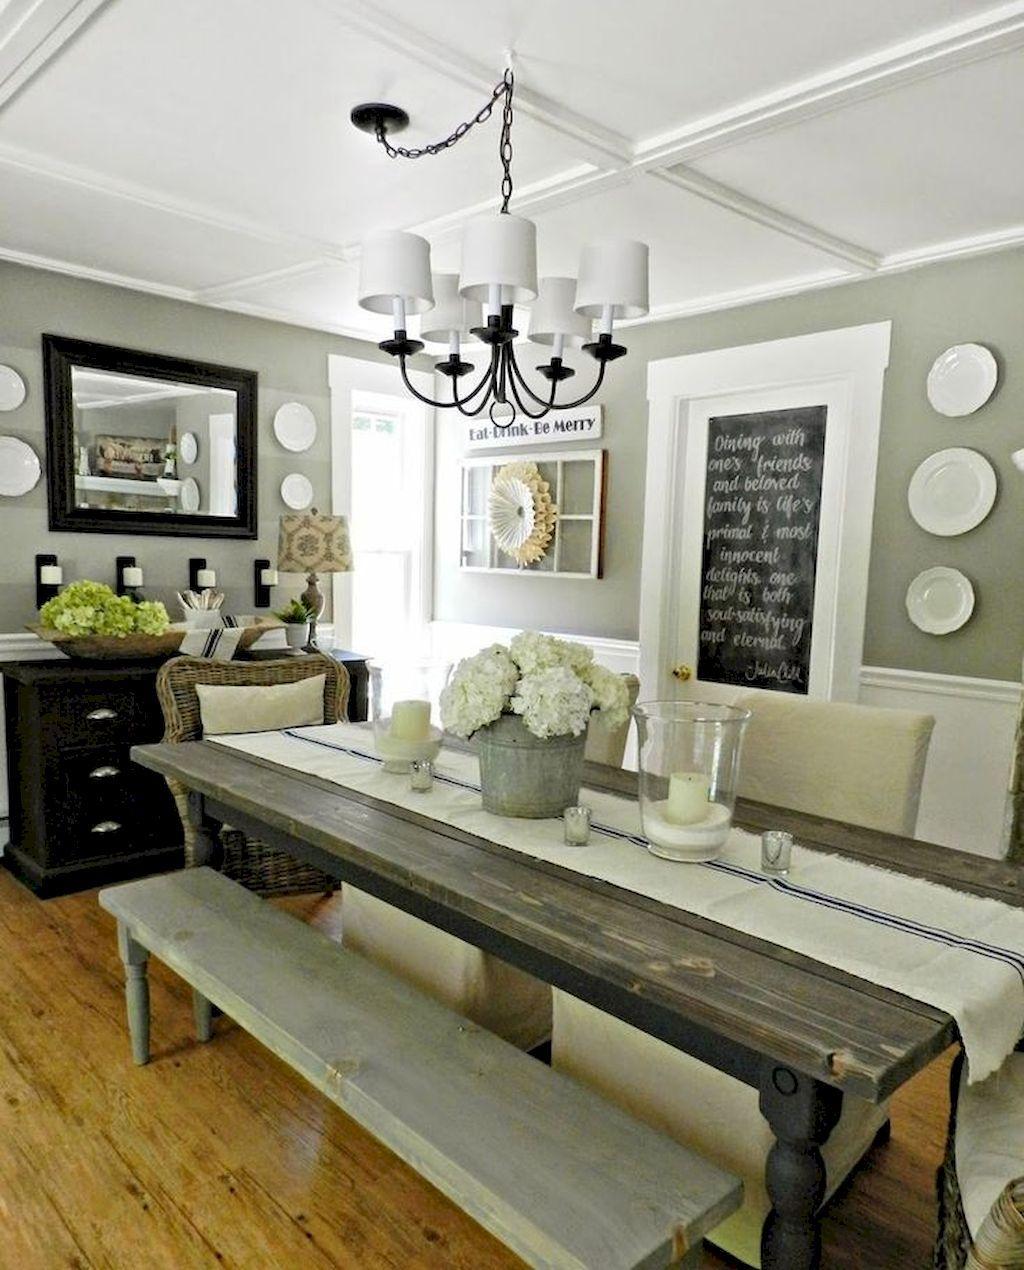 46 Popular Farmhouse Dining Room Design Ideas Trend 2019: 100 Best Farmhouse Dining Room Decor Ideas